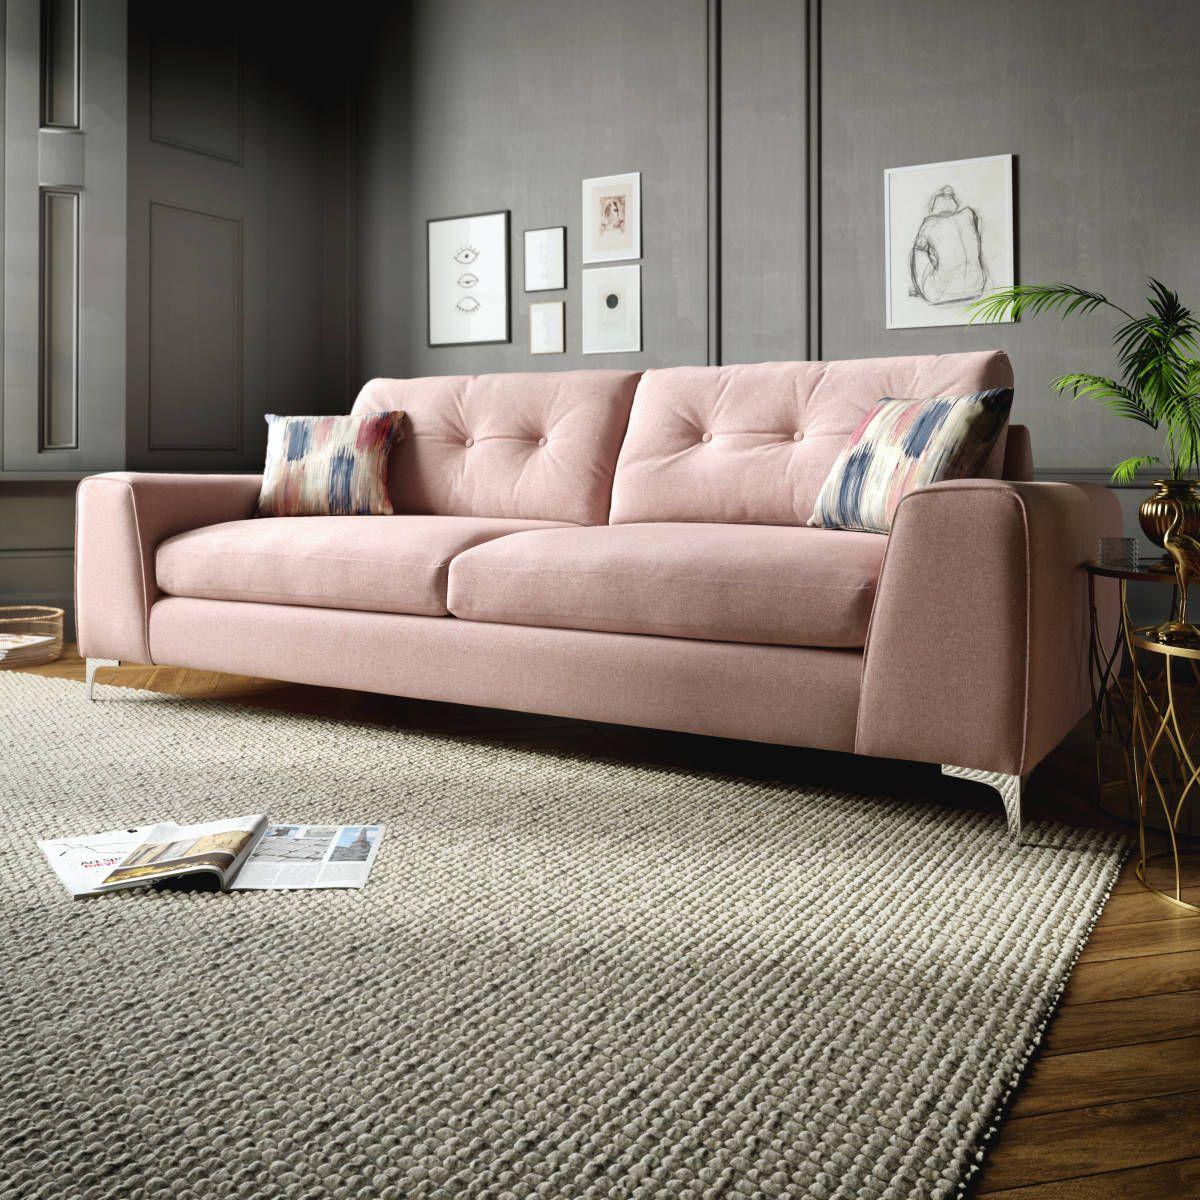 Demure Sofology Chesterfield Sofa Sofa Demure